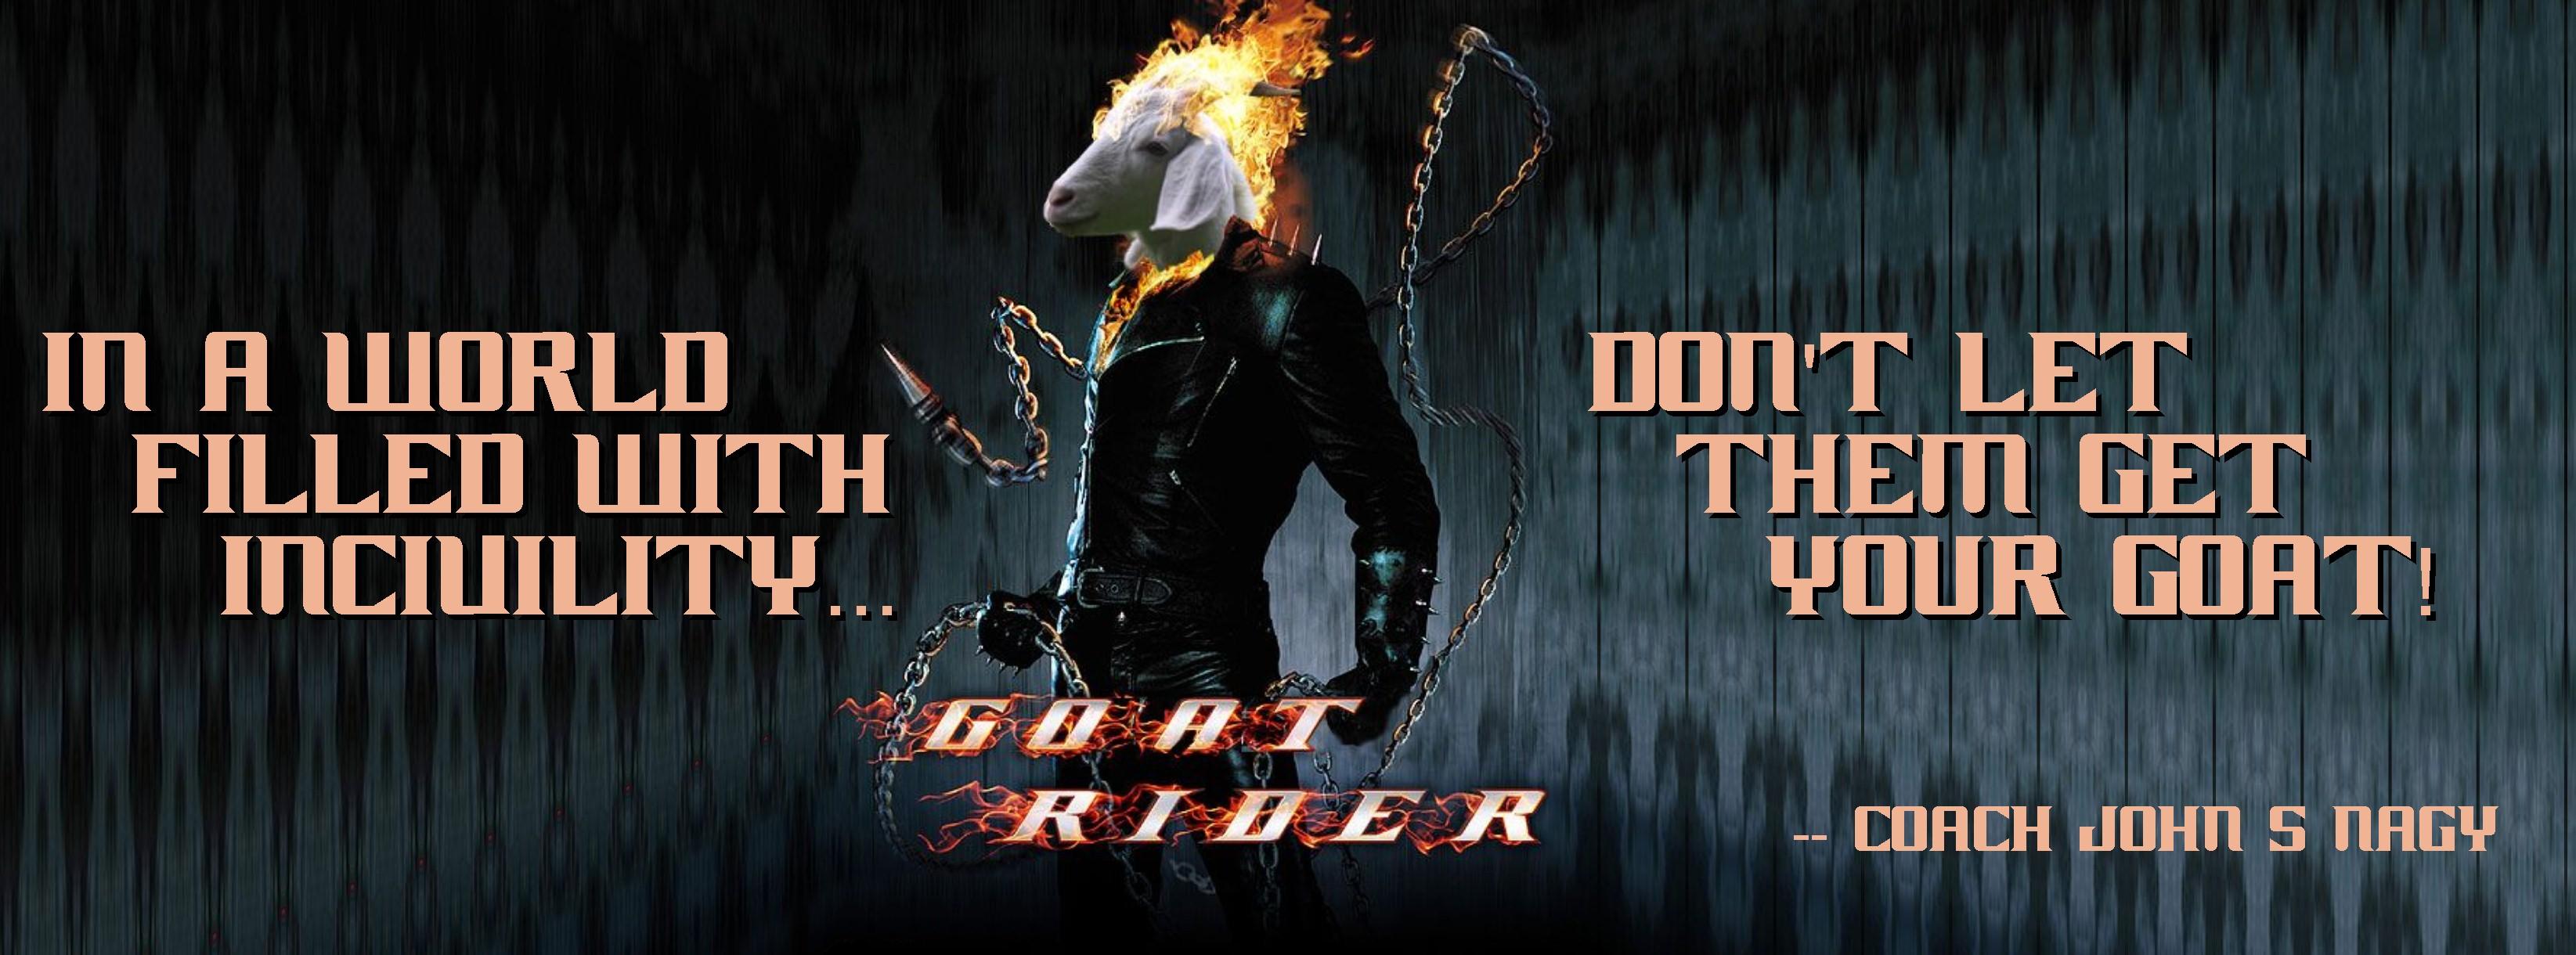 Goat Rider_01.JPG